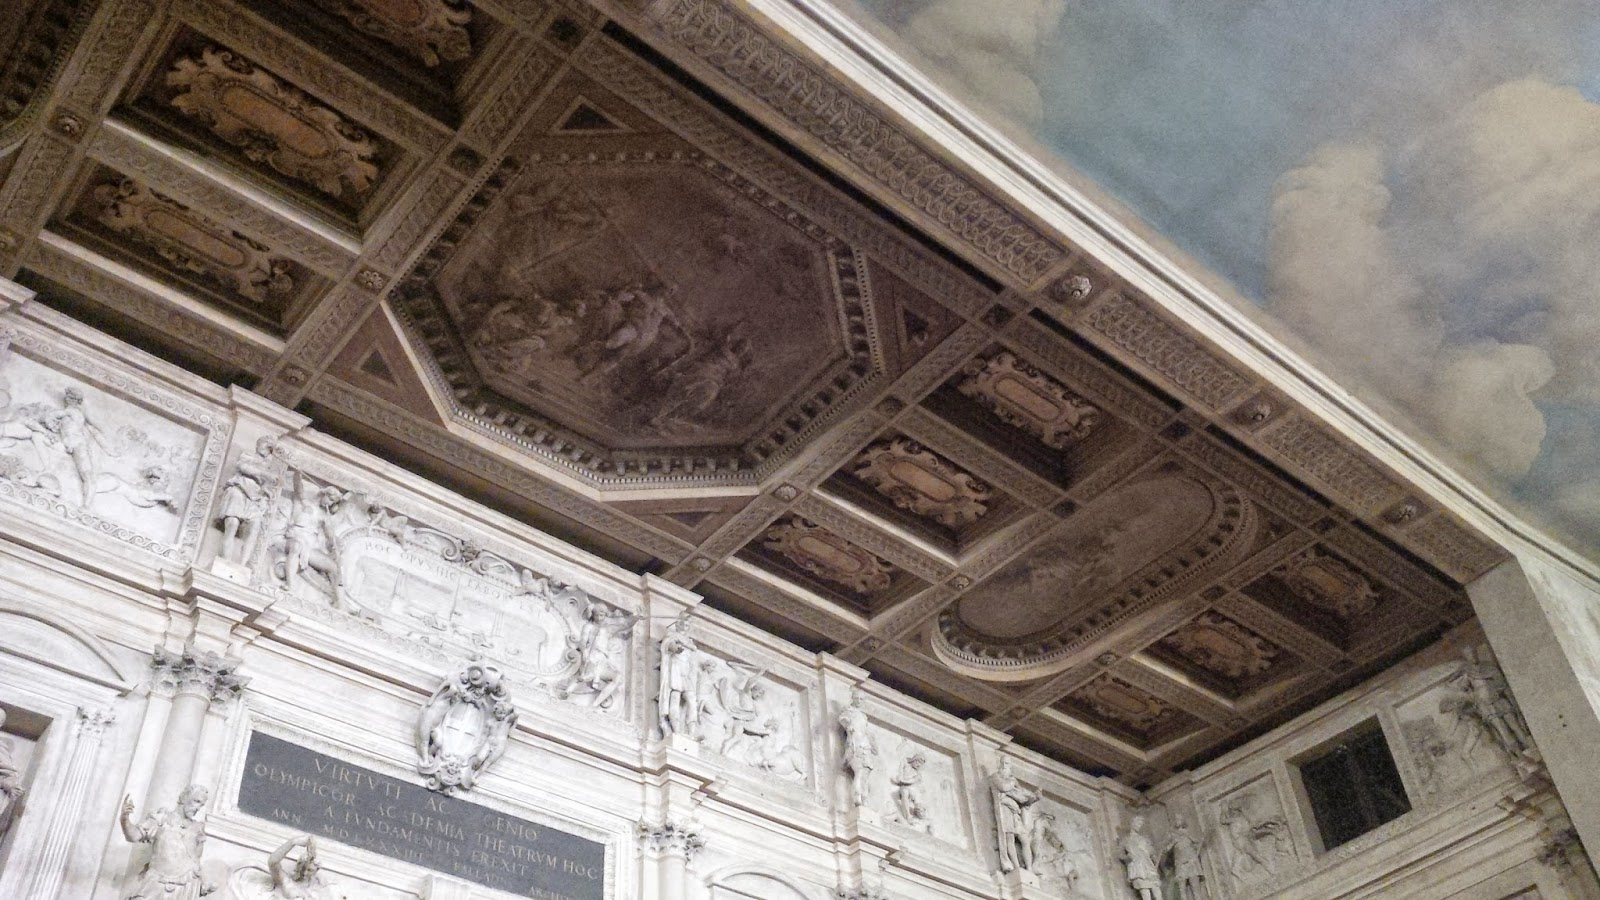 The ceiling of Teatro Olimpico in Vicenza